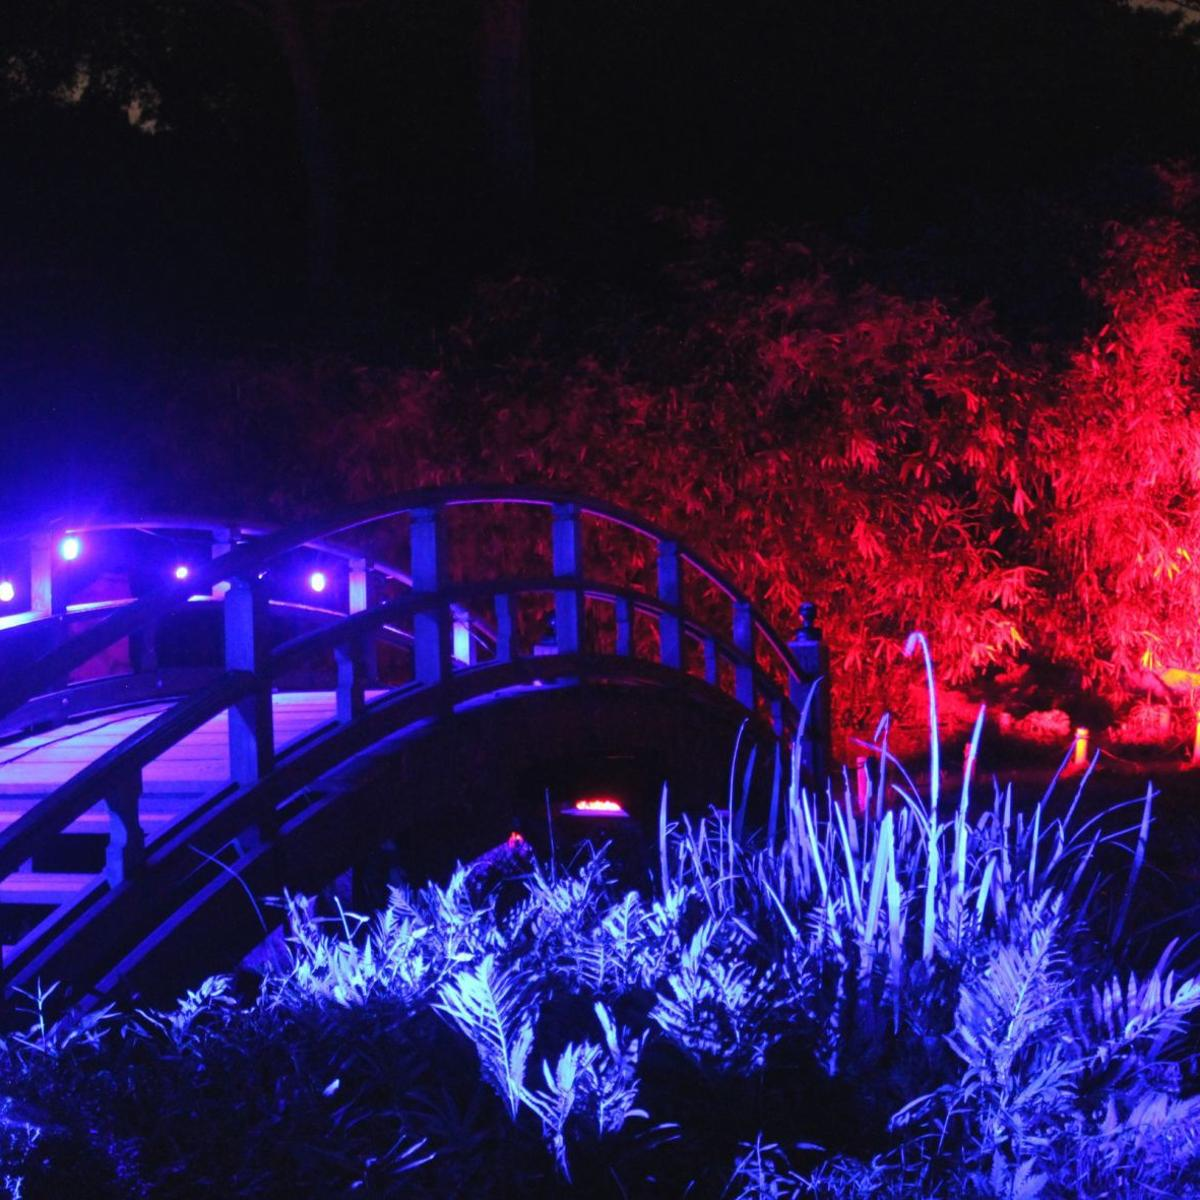 Maymont To Light Up Japanese Garden For Night Time Garden Glow Entertainment Richmond Com